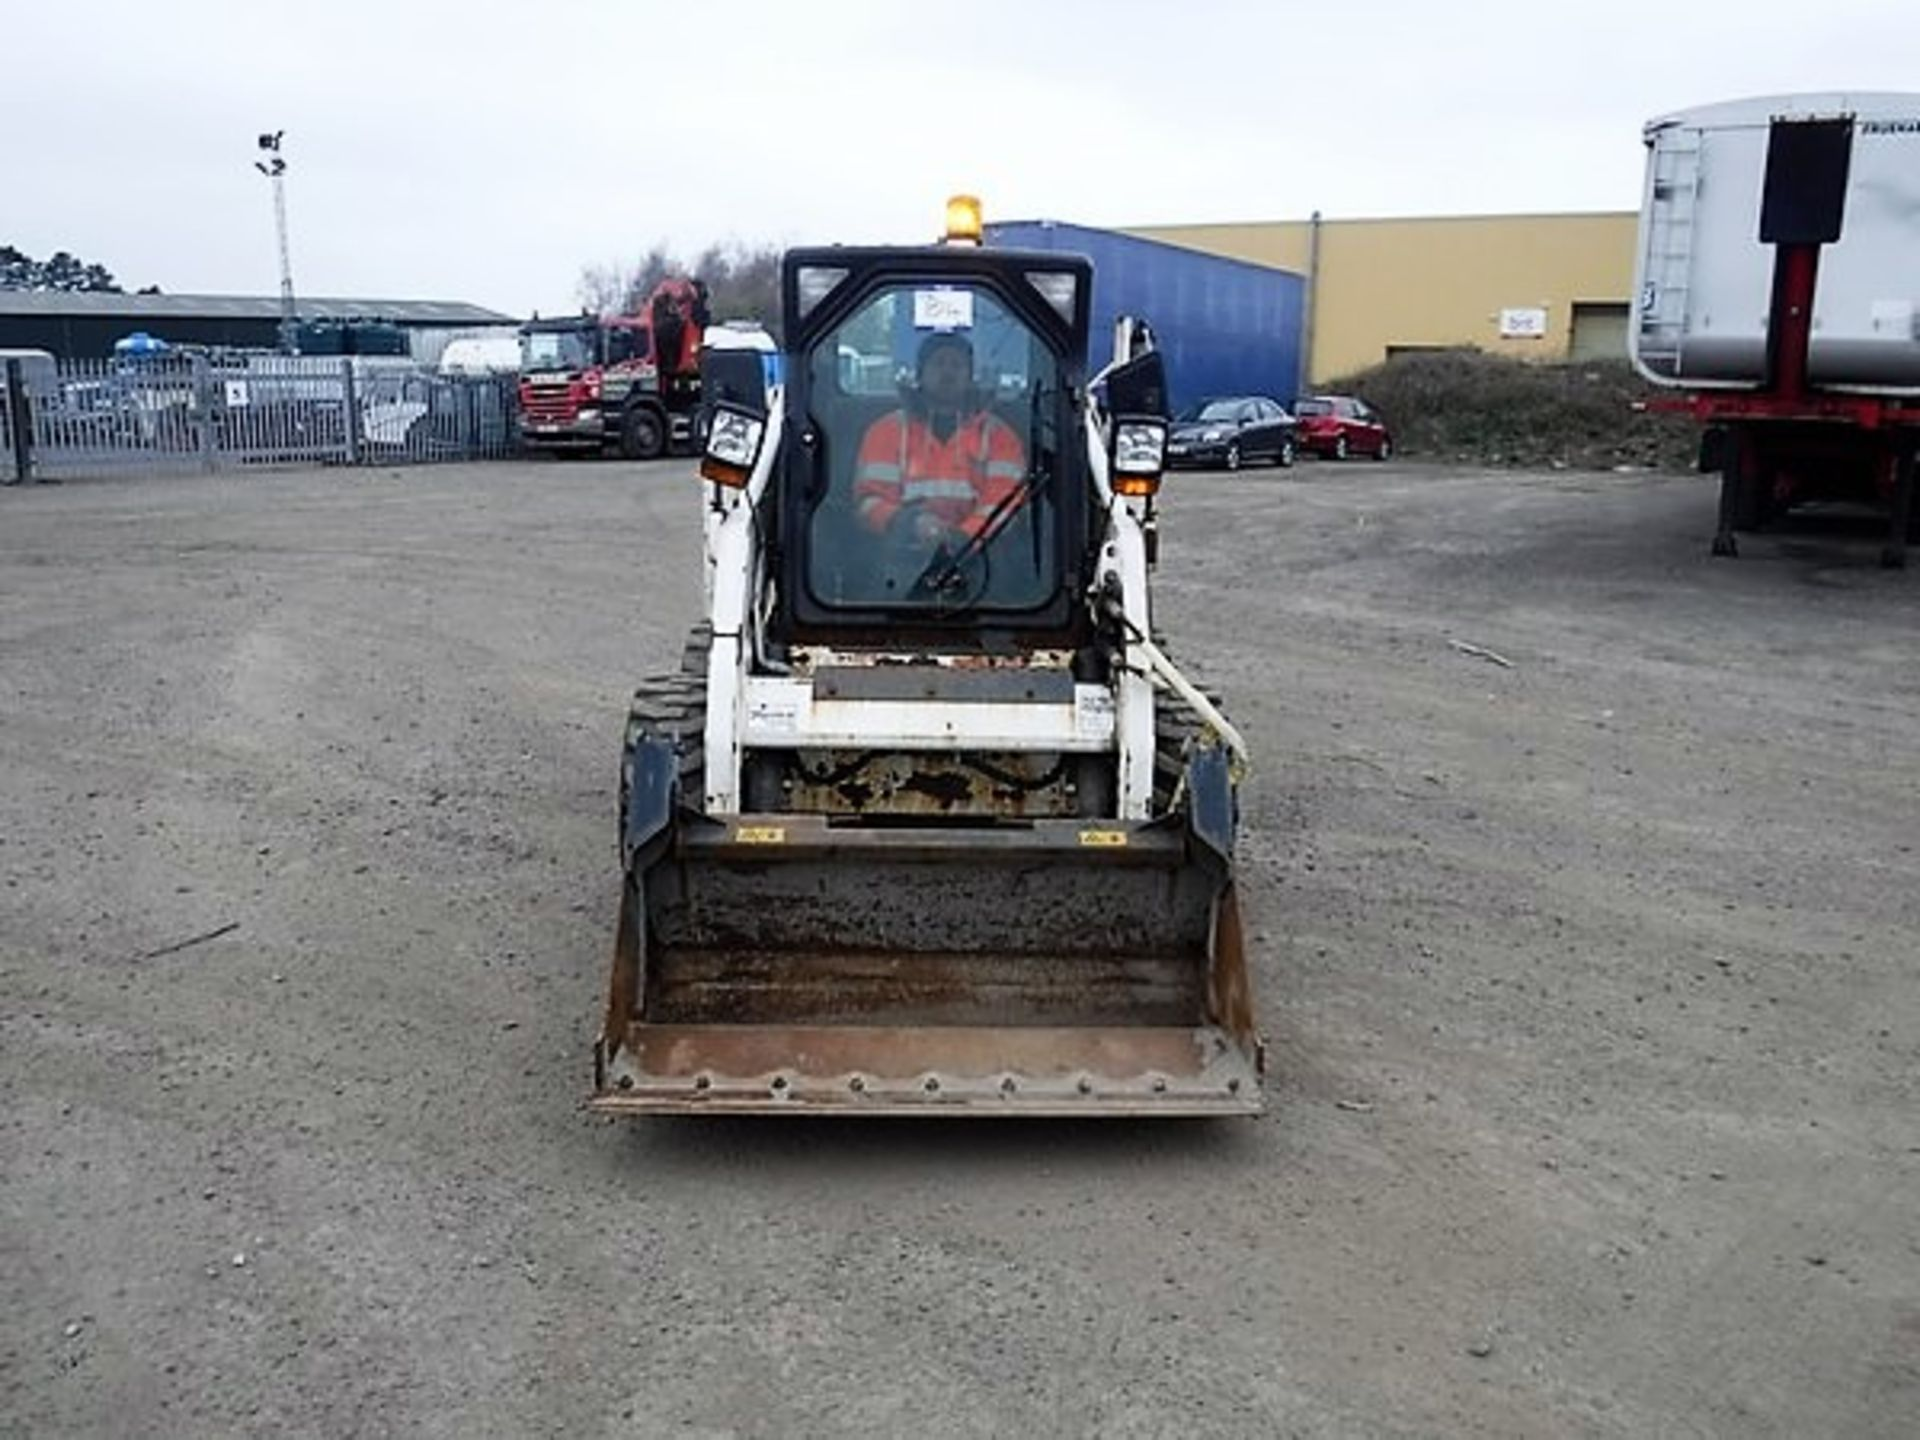 Auktionslos 859 - BOBCAT S160 c/w one bucket 163hrs. S/N A8L470180. *NO KEYS*